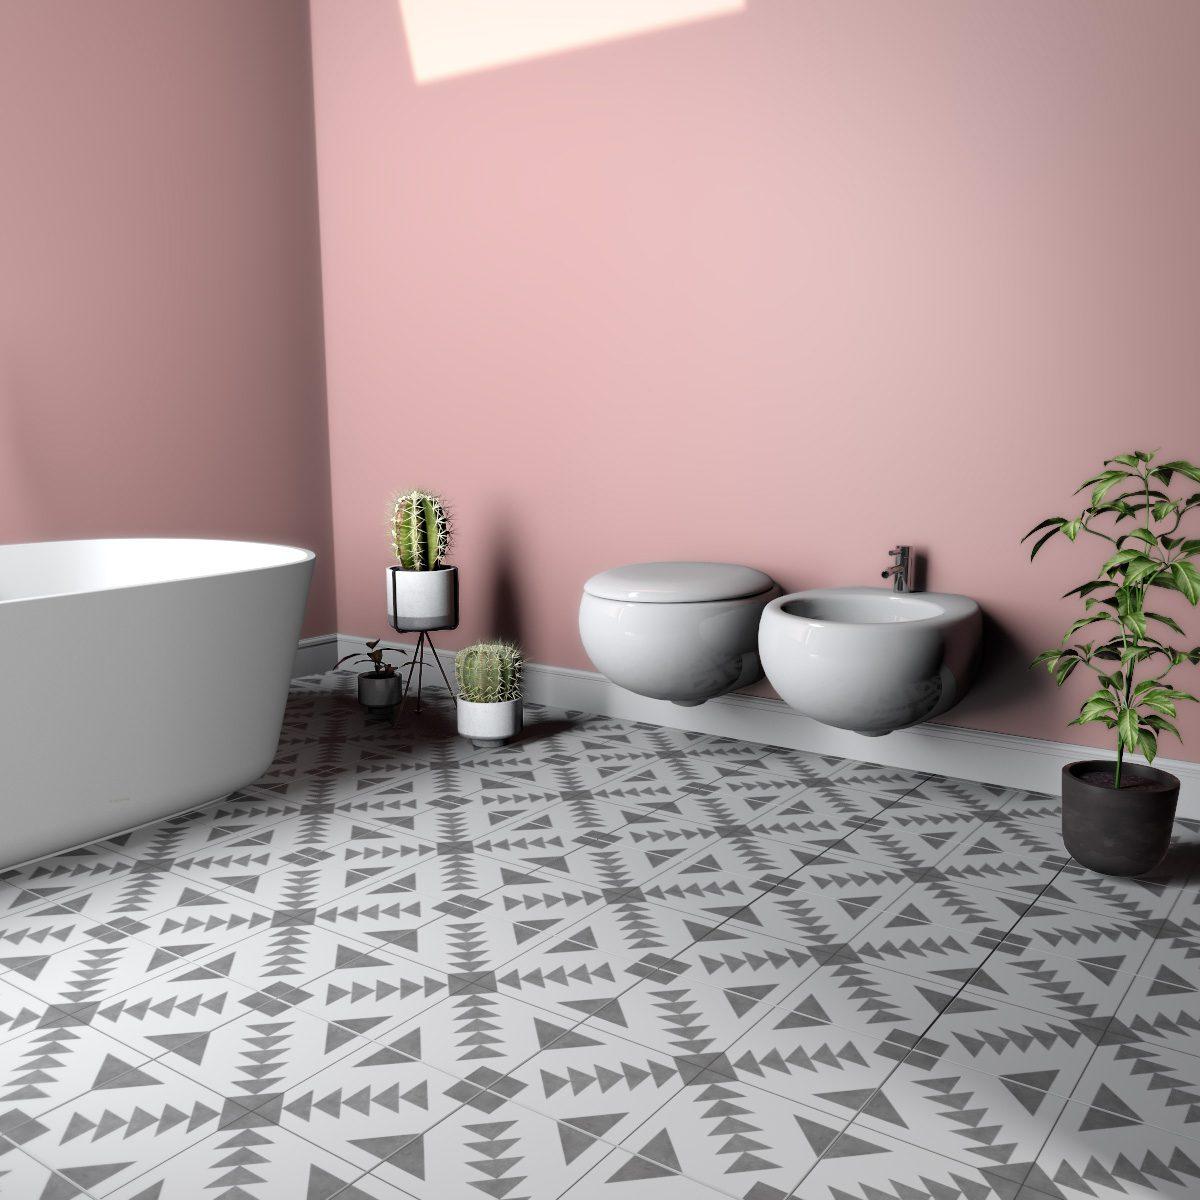 Kitchen Bathroom Ceramic Wall Tile Self Adhesive 145mm Cut Vinyl Sticker Covers